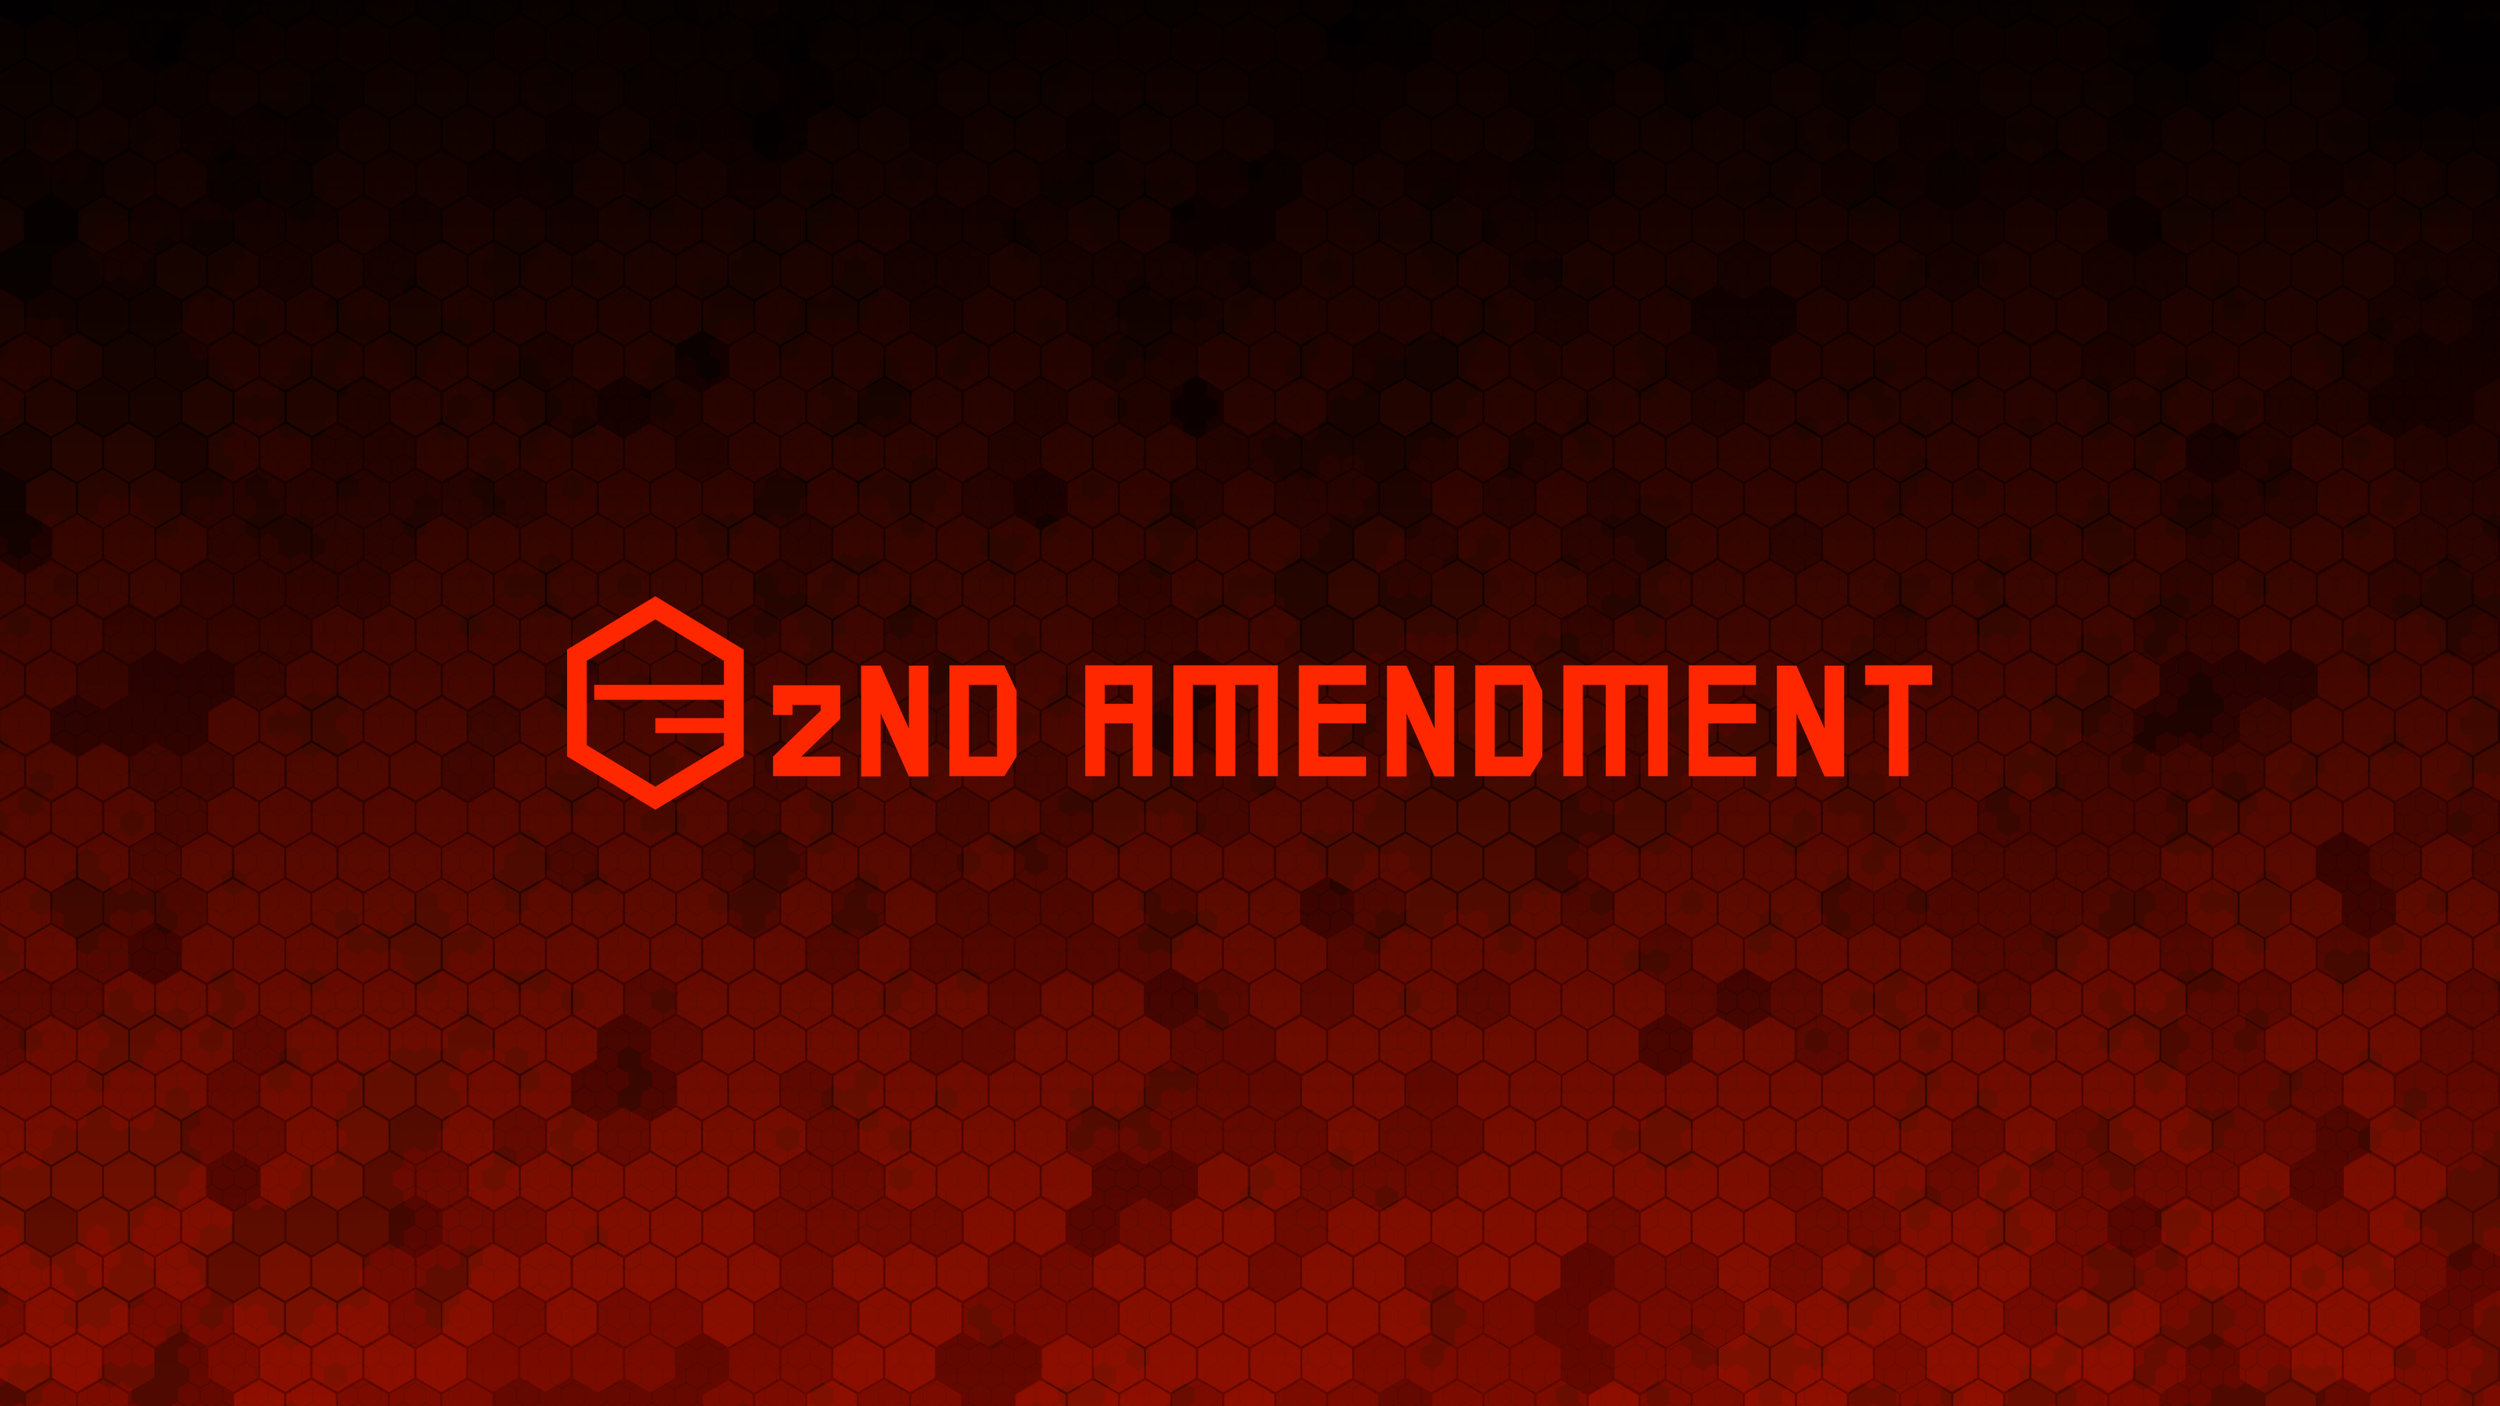 2nd Amendment 4K Wallpaper